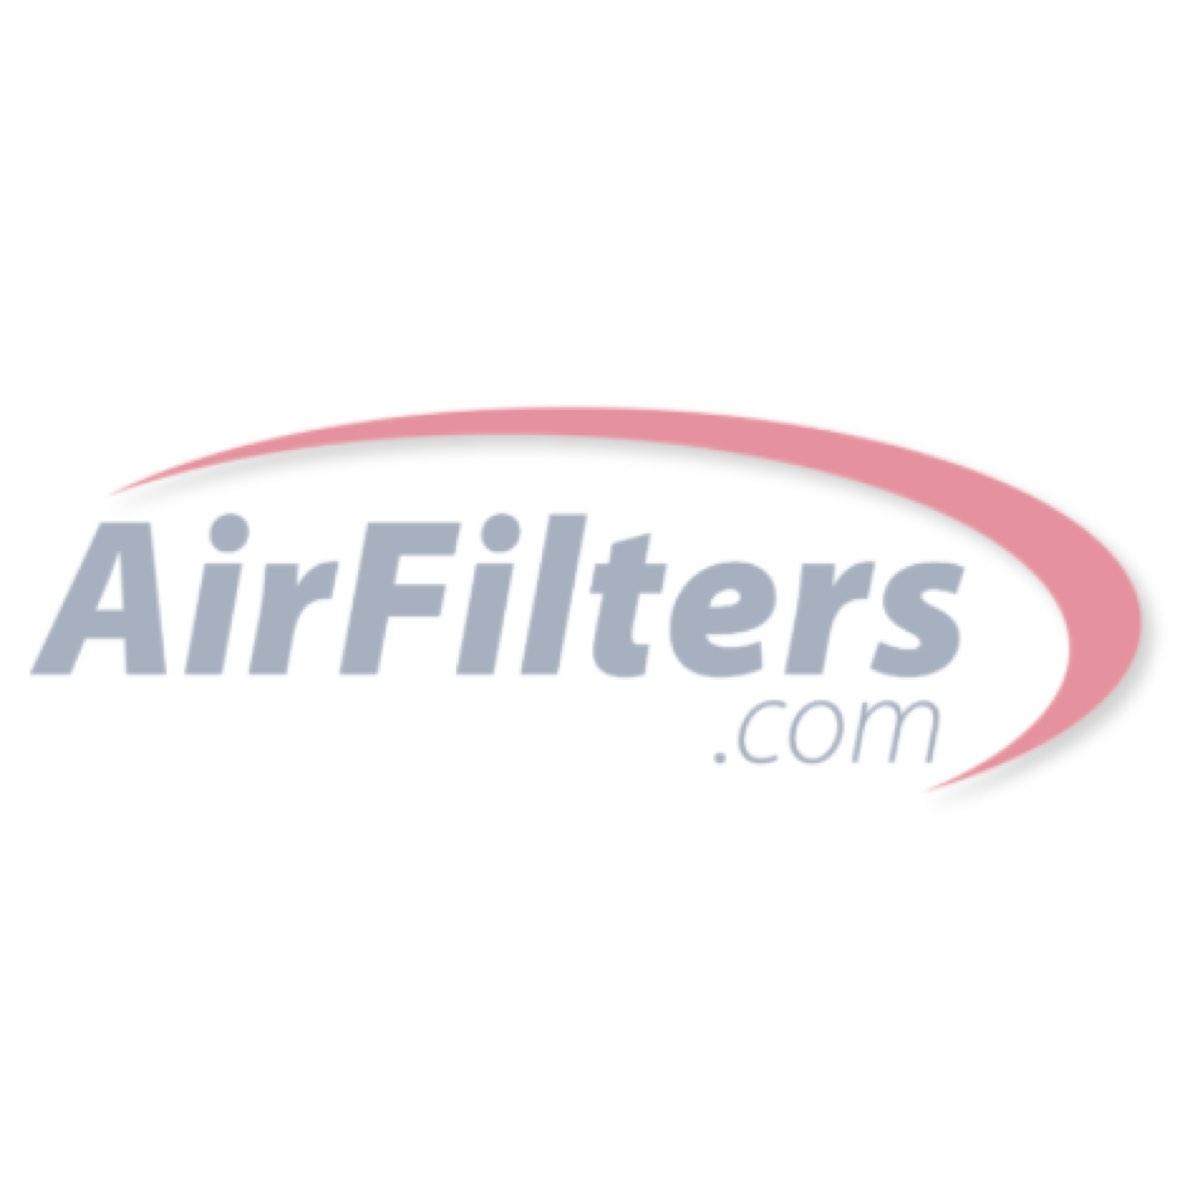 20x20x6 (19.5x19.5x6) Carrier Air Purifier Carbon Filters